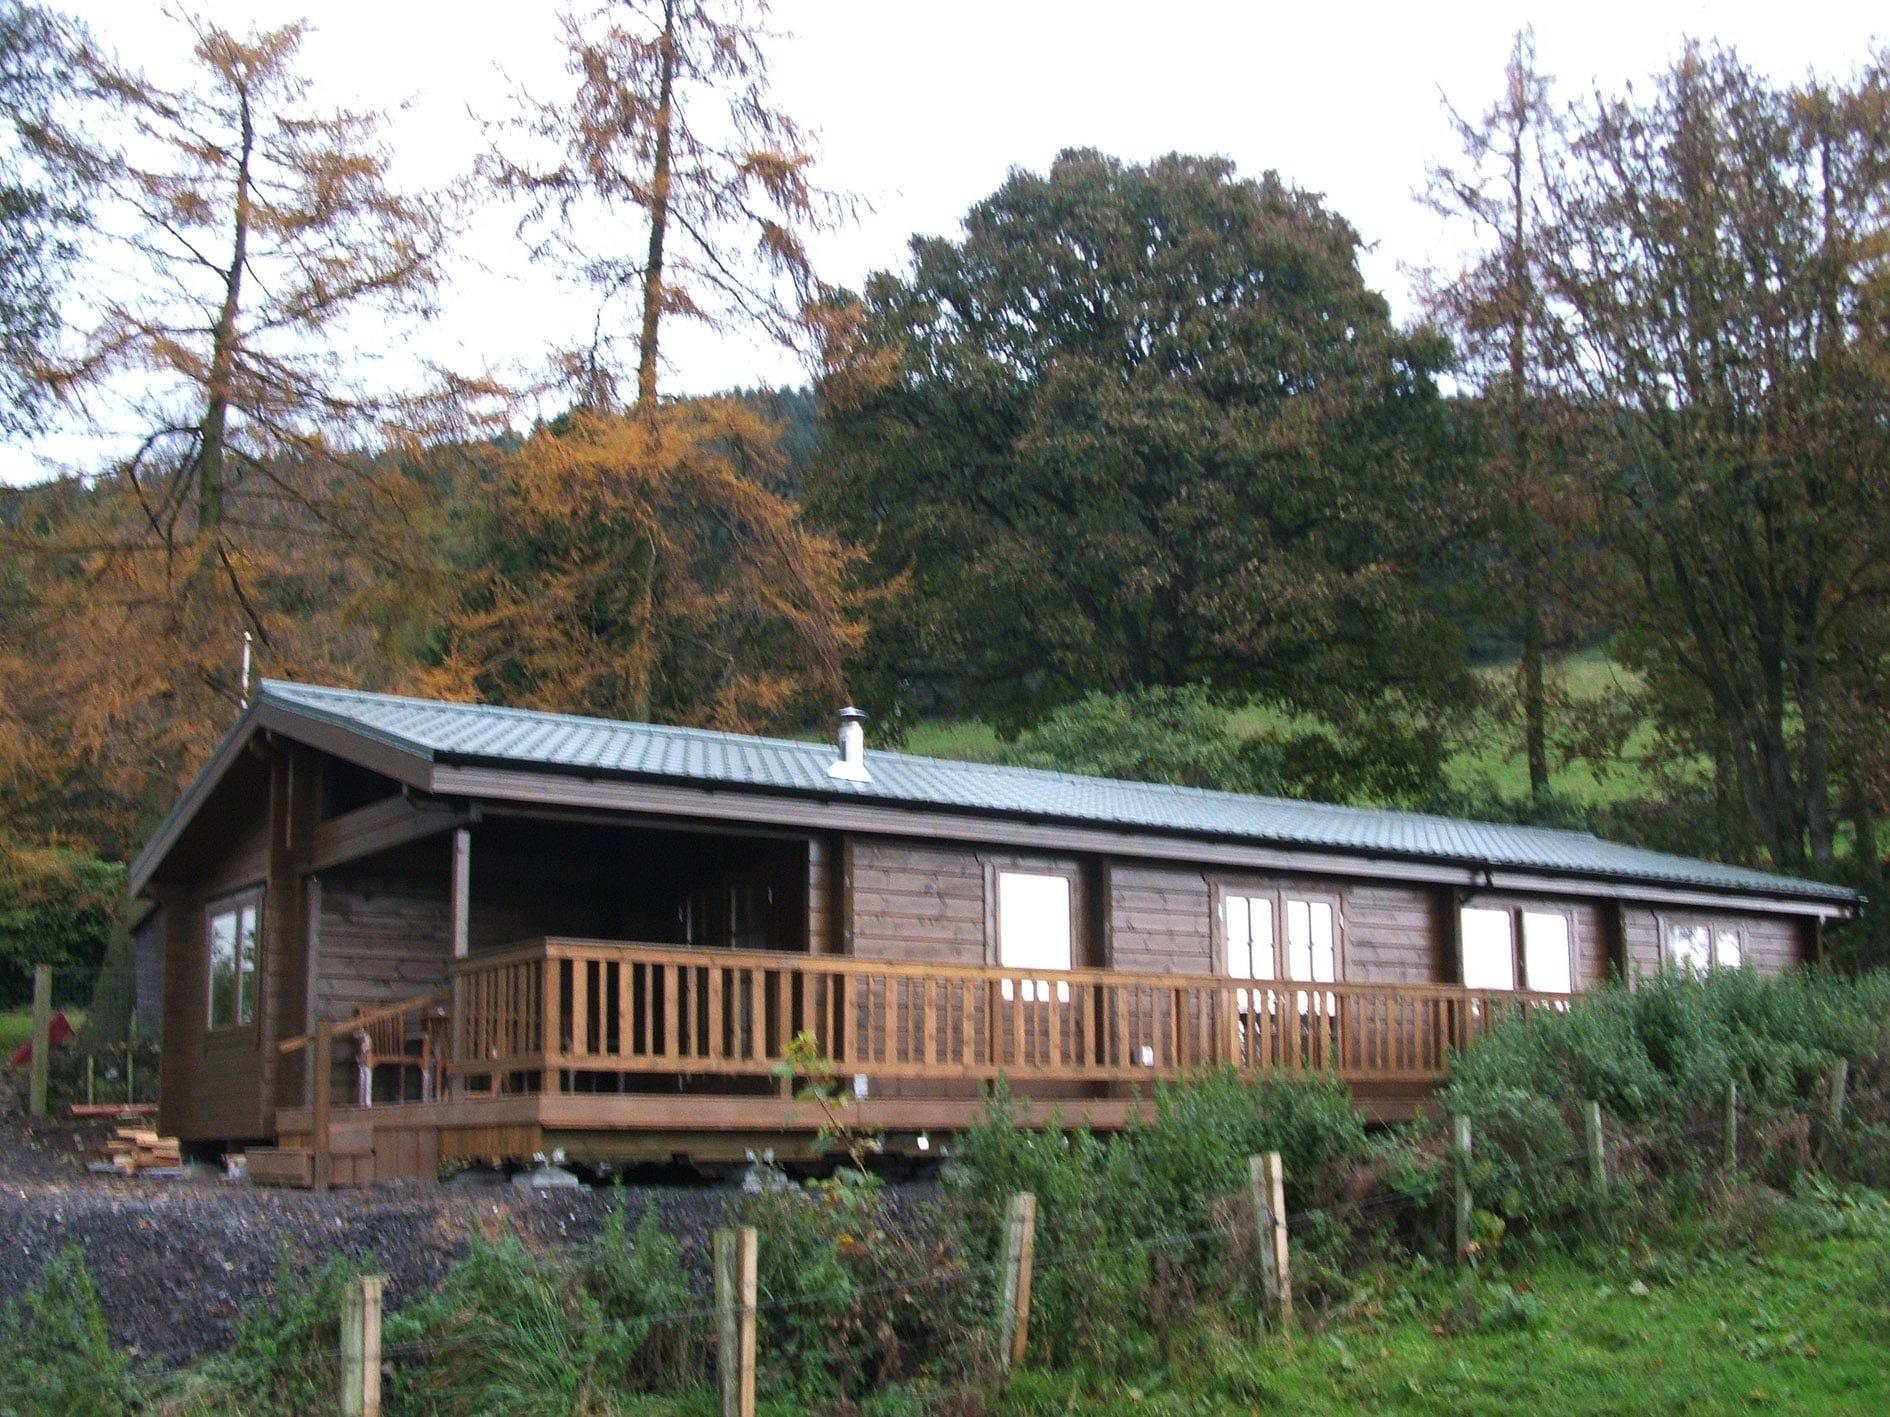 Log cabin in the hillside